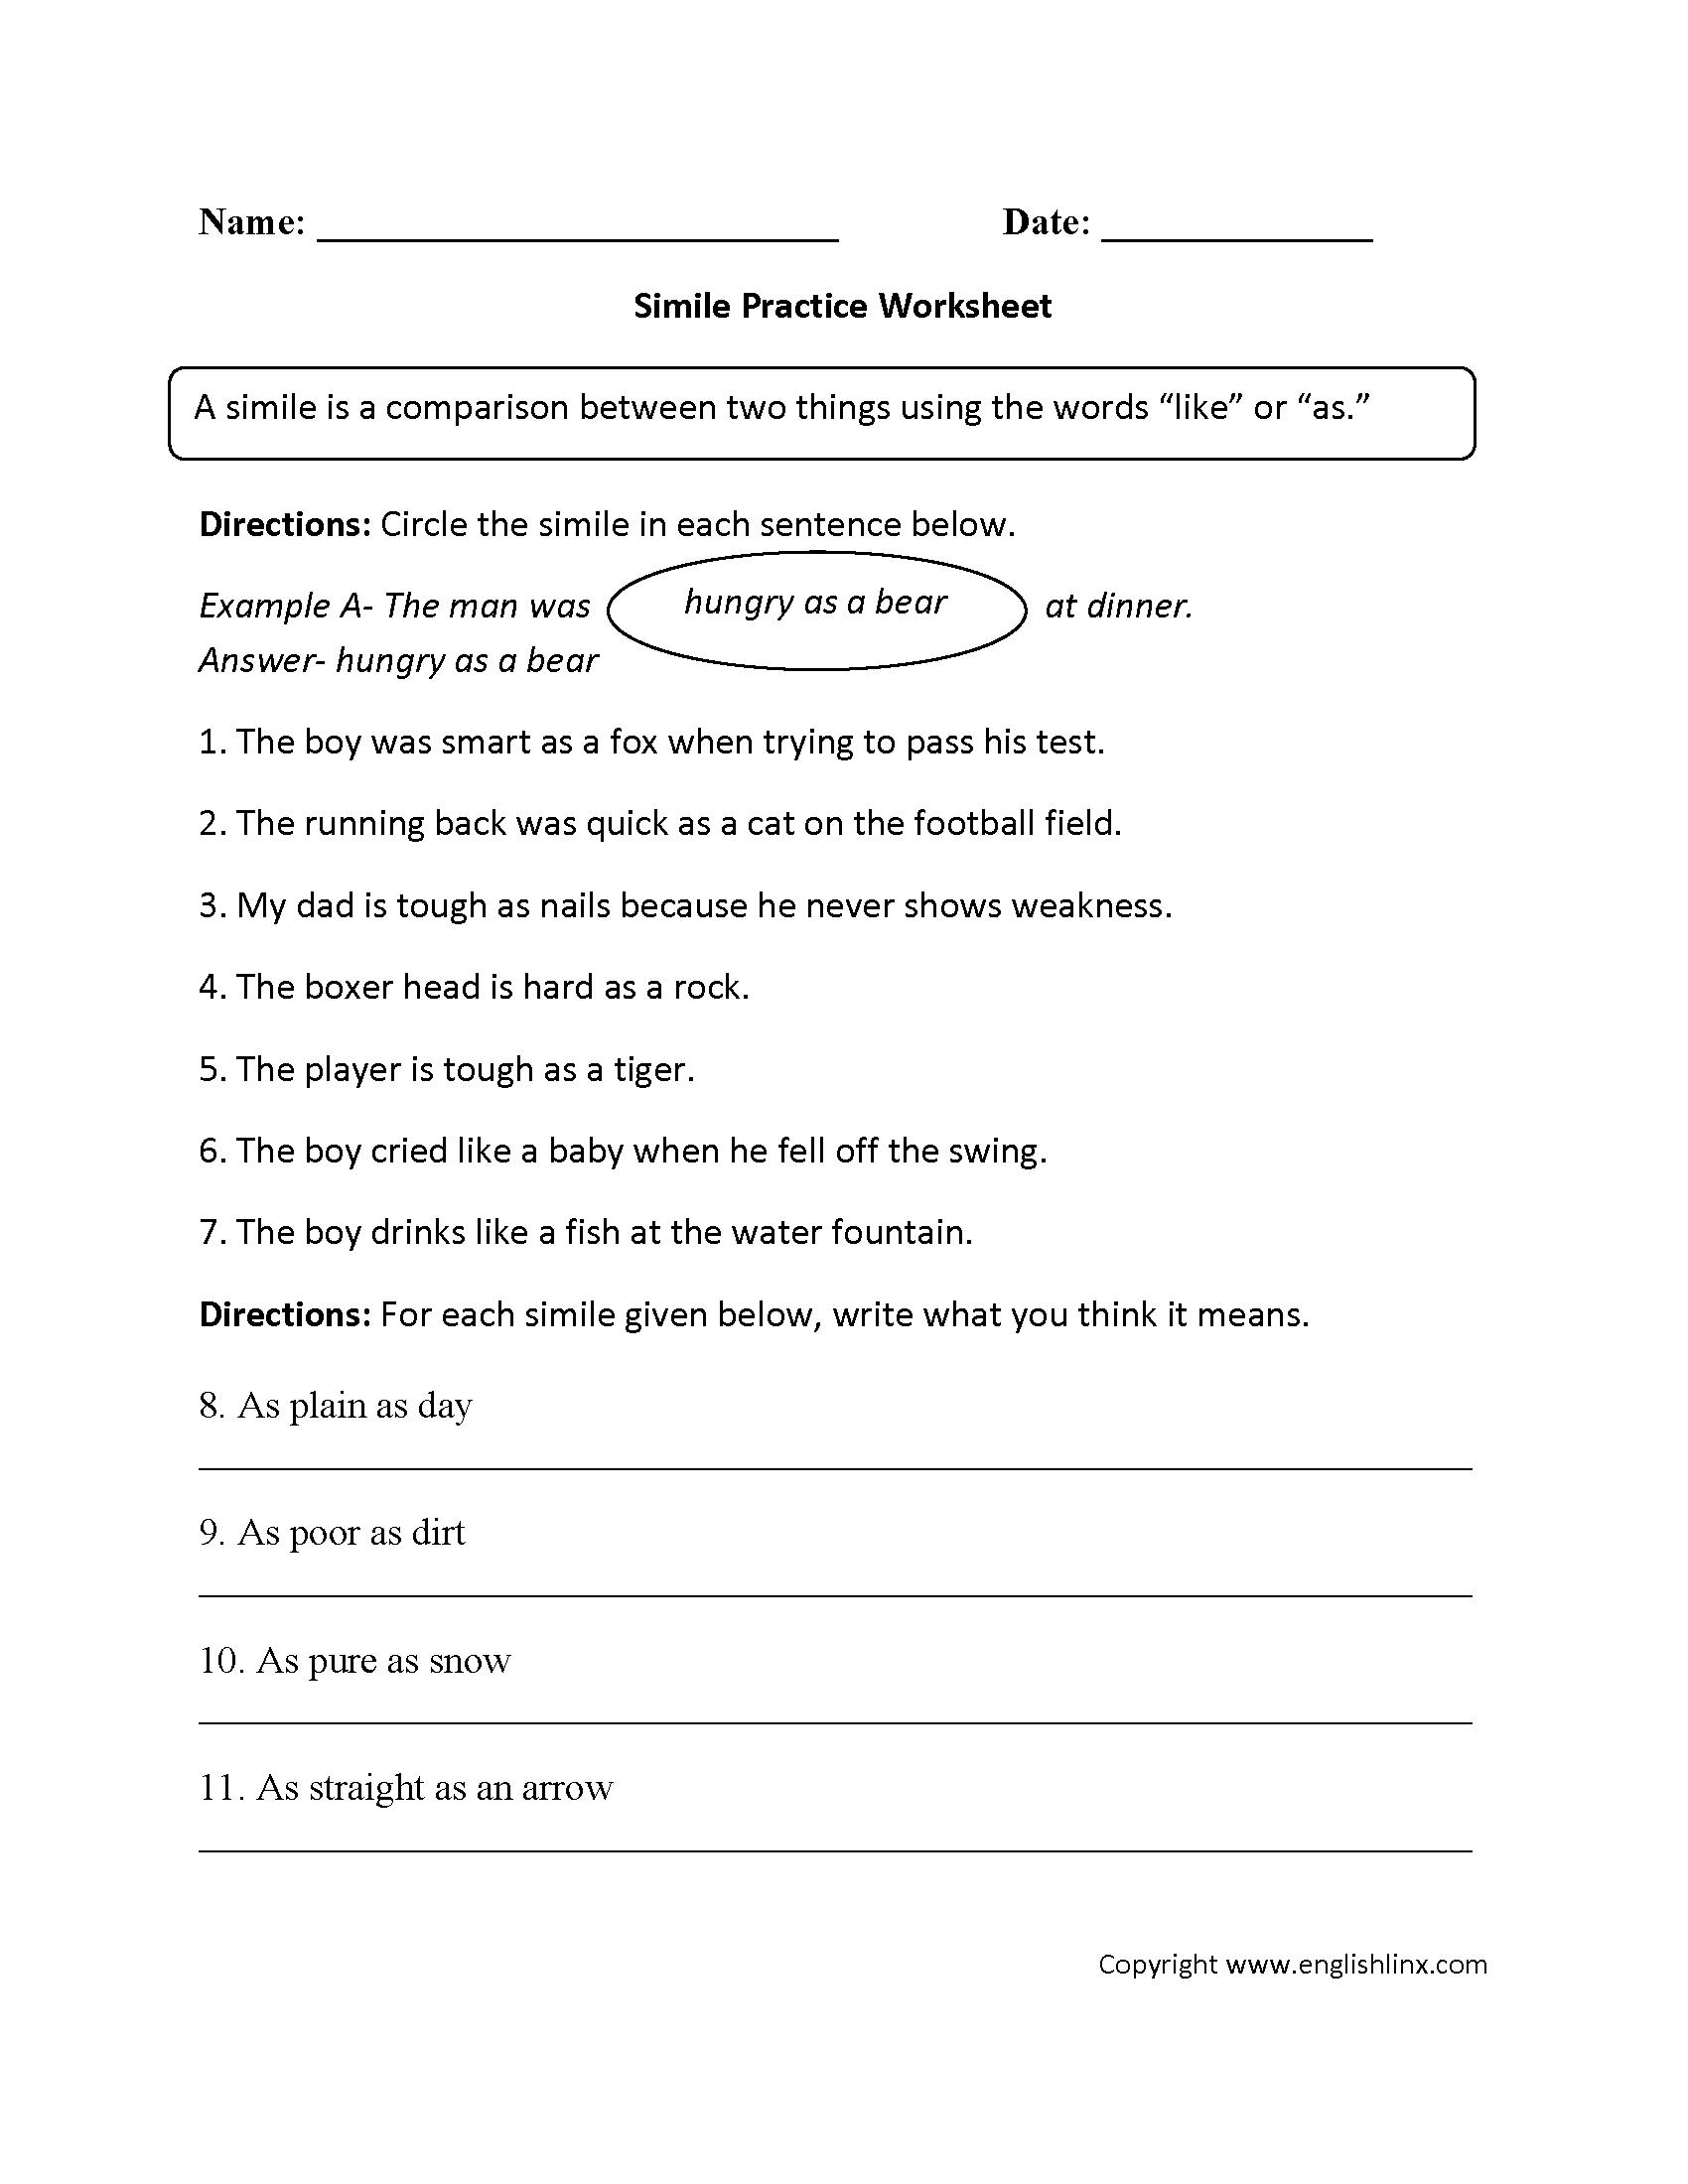 Simile Figurative Language Worksheets | Figurative Language